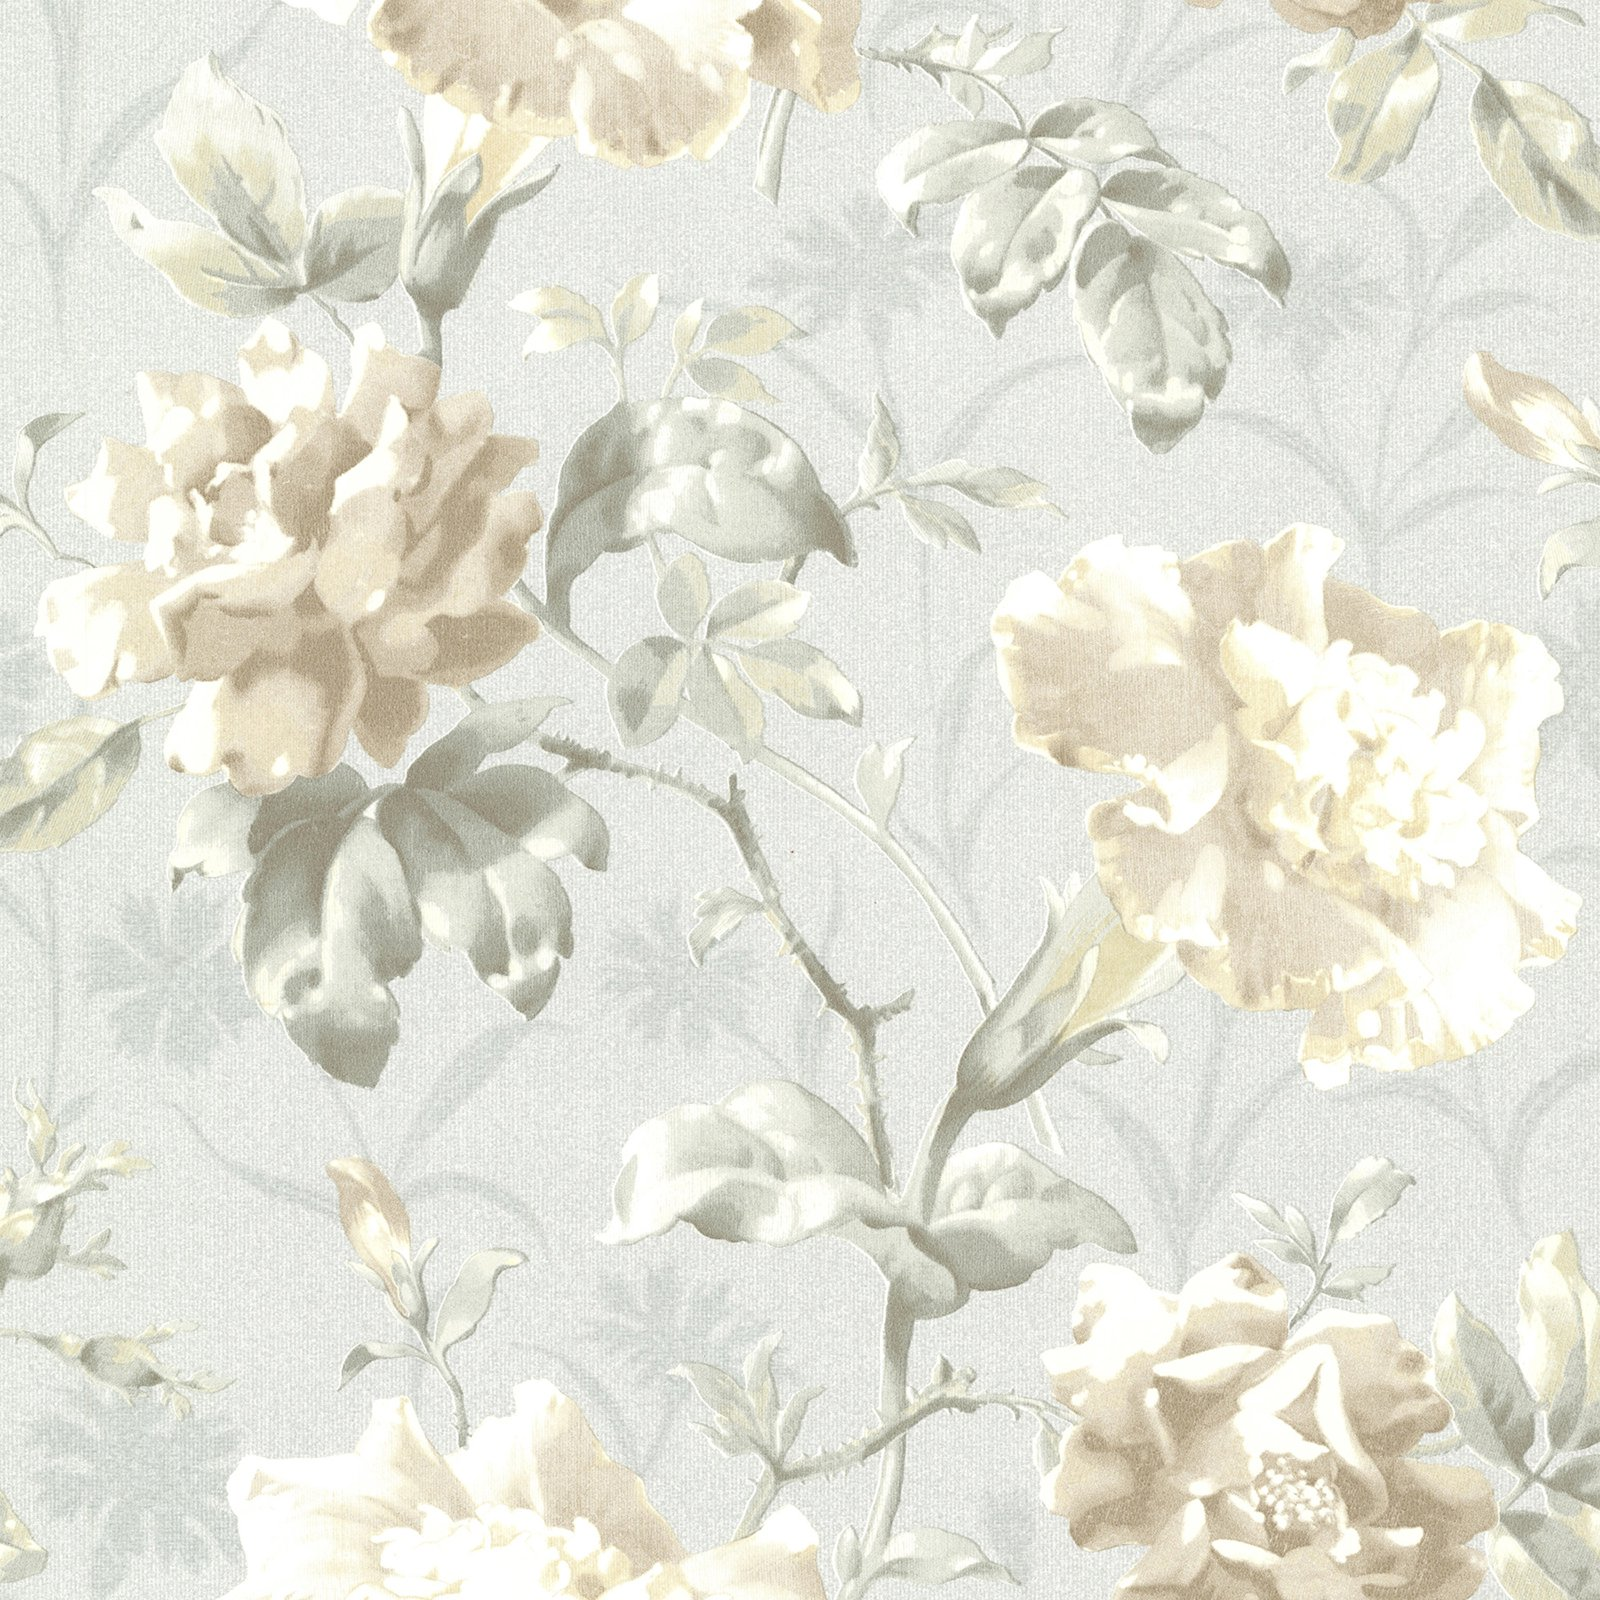 Beacon House Juliana Light Blue Vintage Floral Wallpaper Walmart